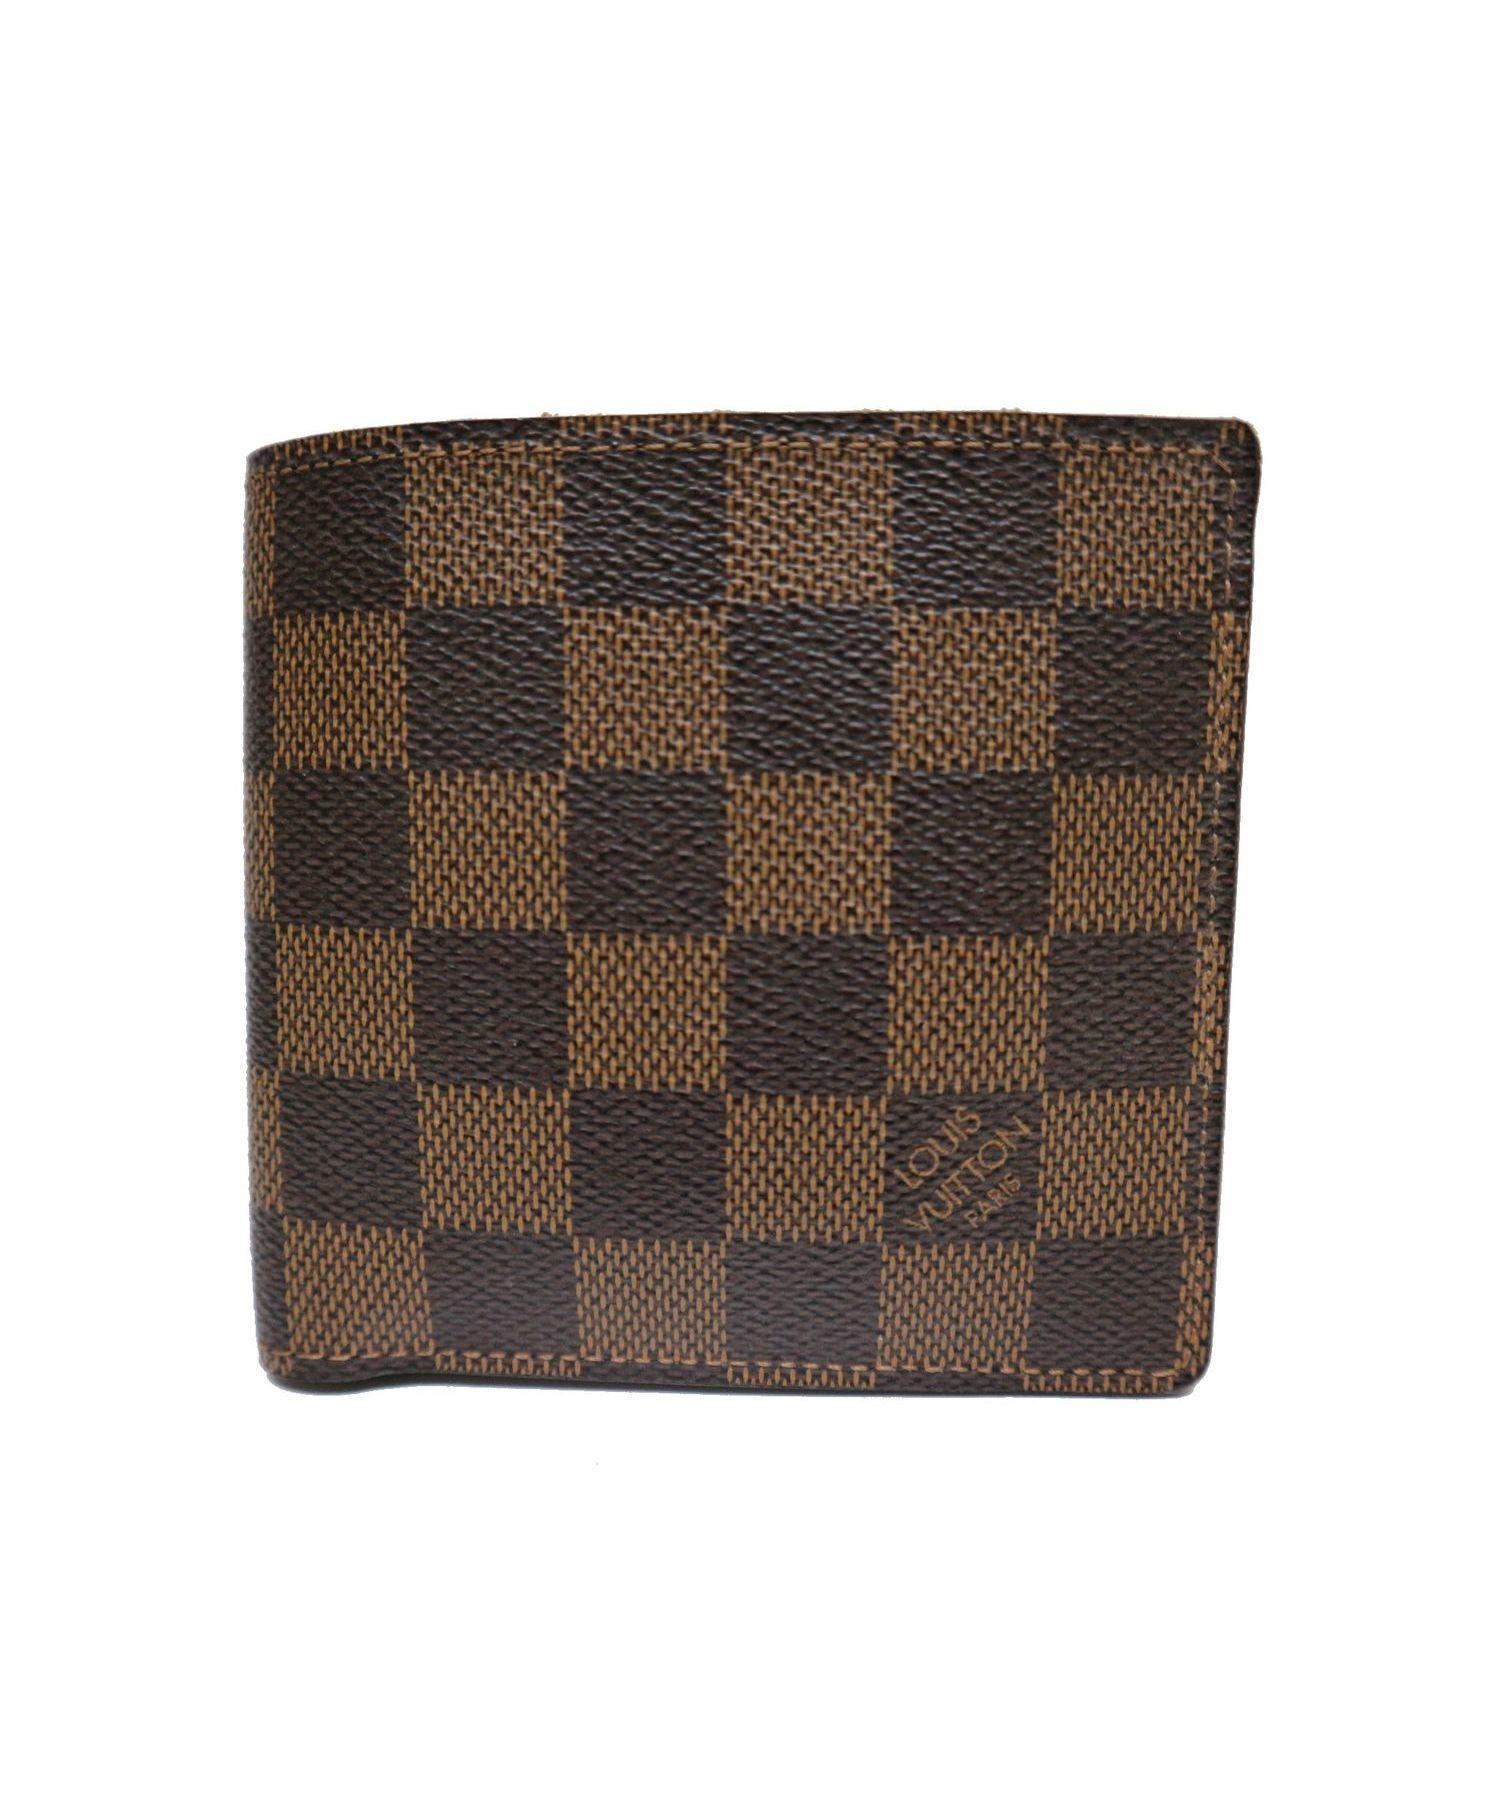 outlet store e1ce5 8e2d4 [中古]LOUIS VUITTON(ルイ・ヴィトン)のレディース 服飾小物 2つ折り財布